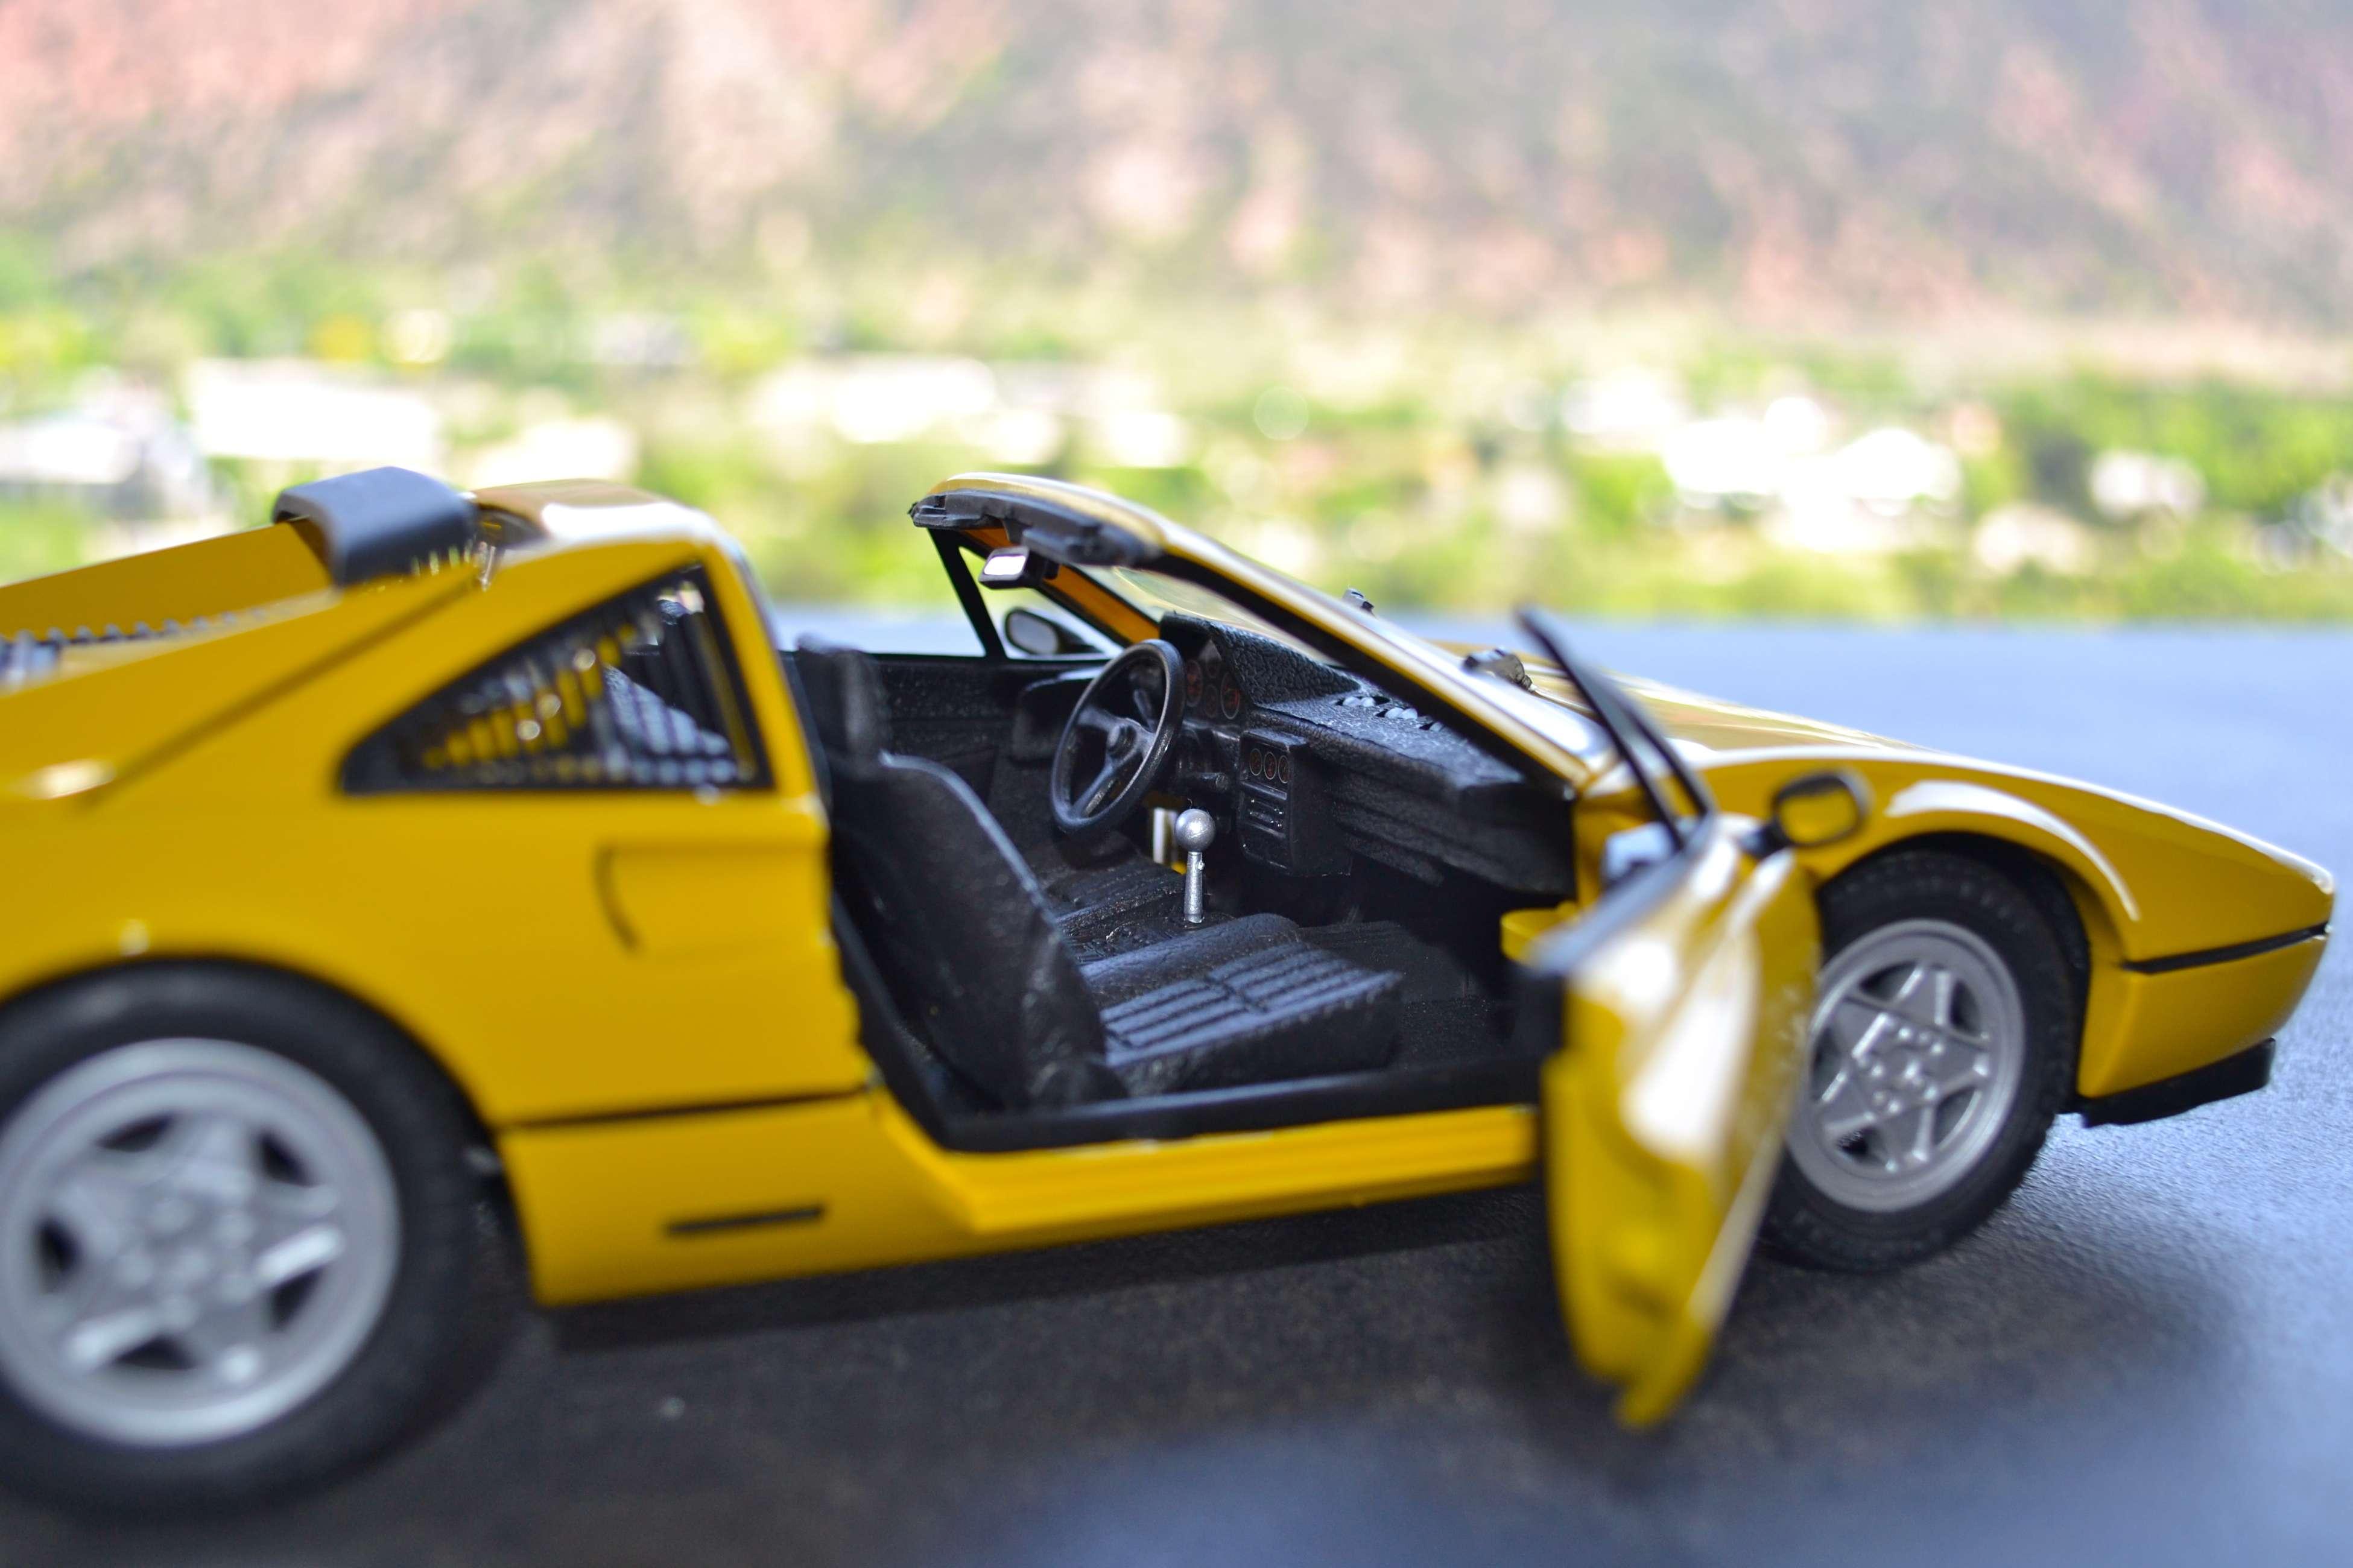 dsc1110c Fabulous Ferrari Mondial 8 Super Elite Cars Trend